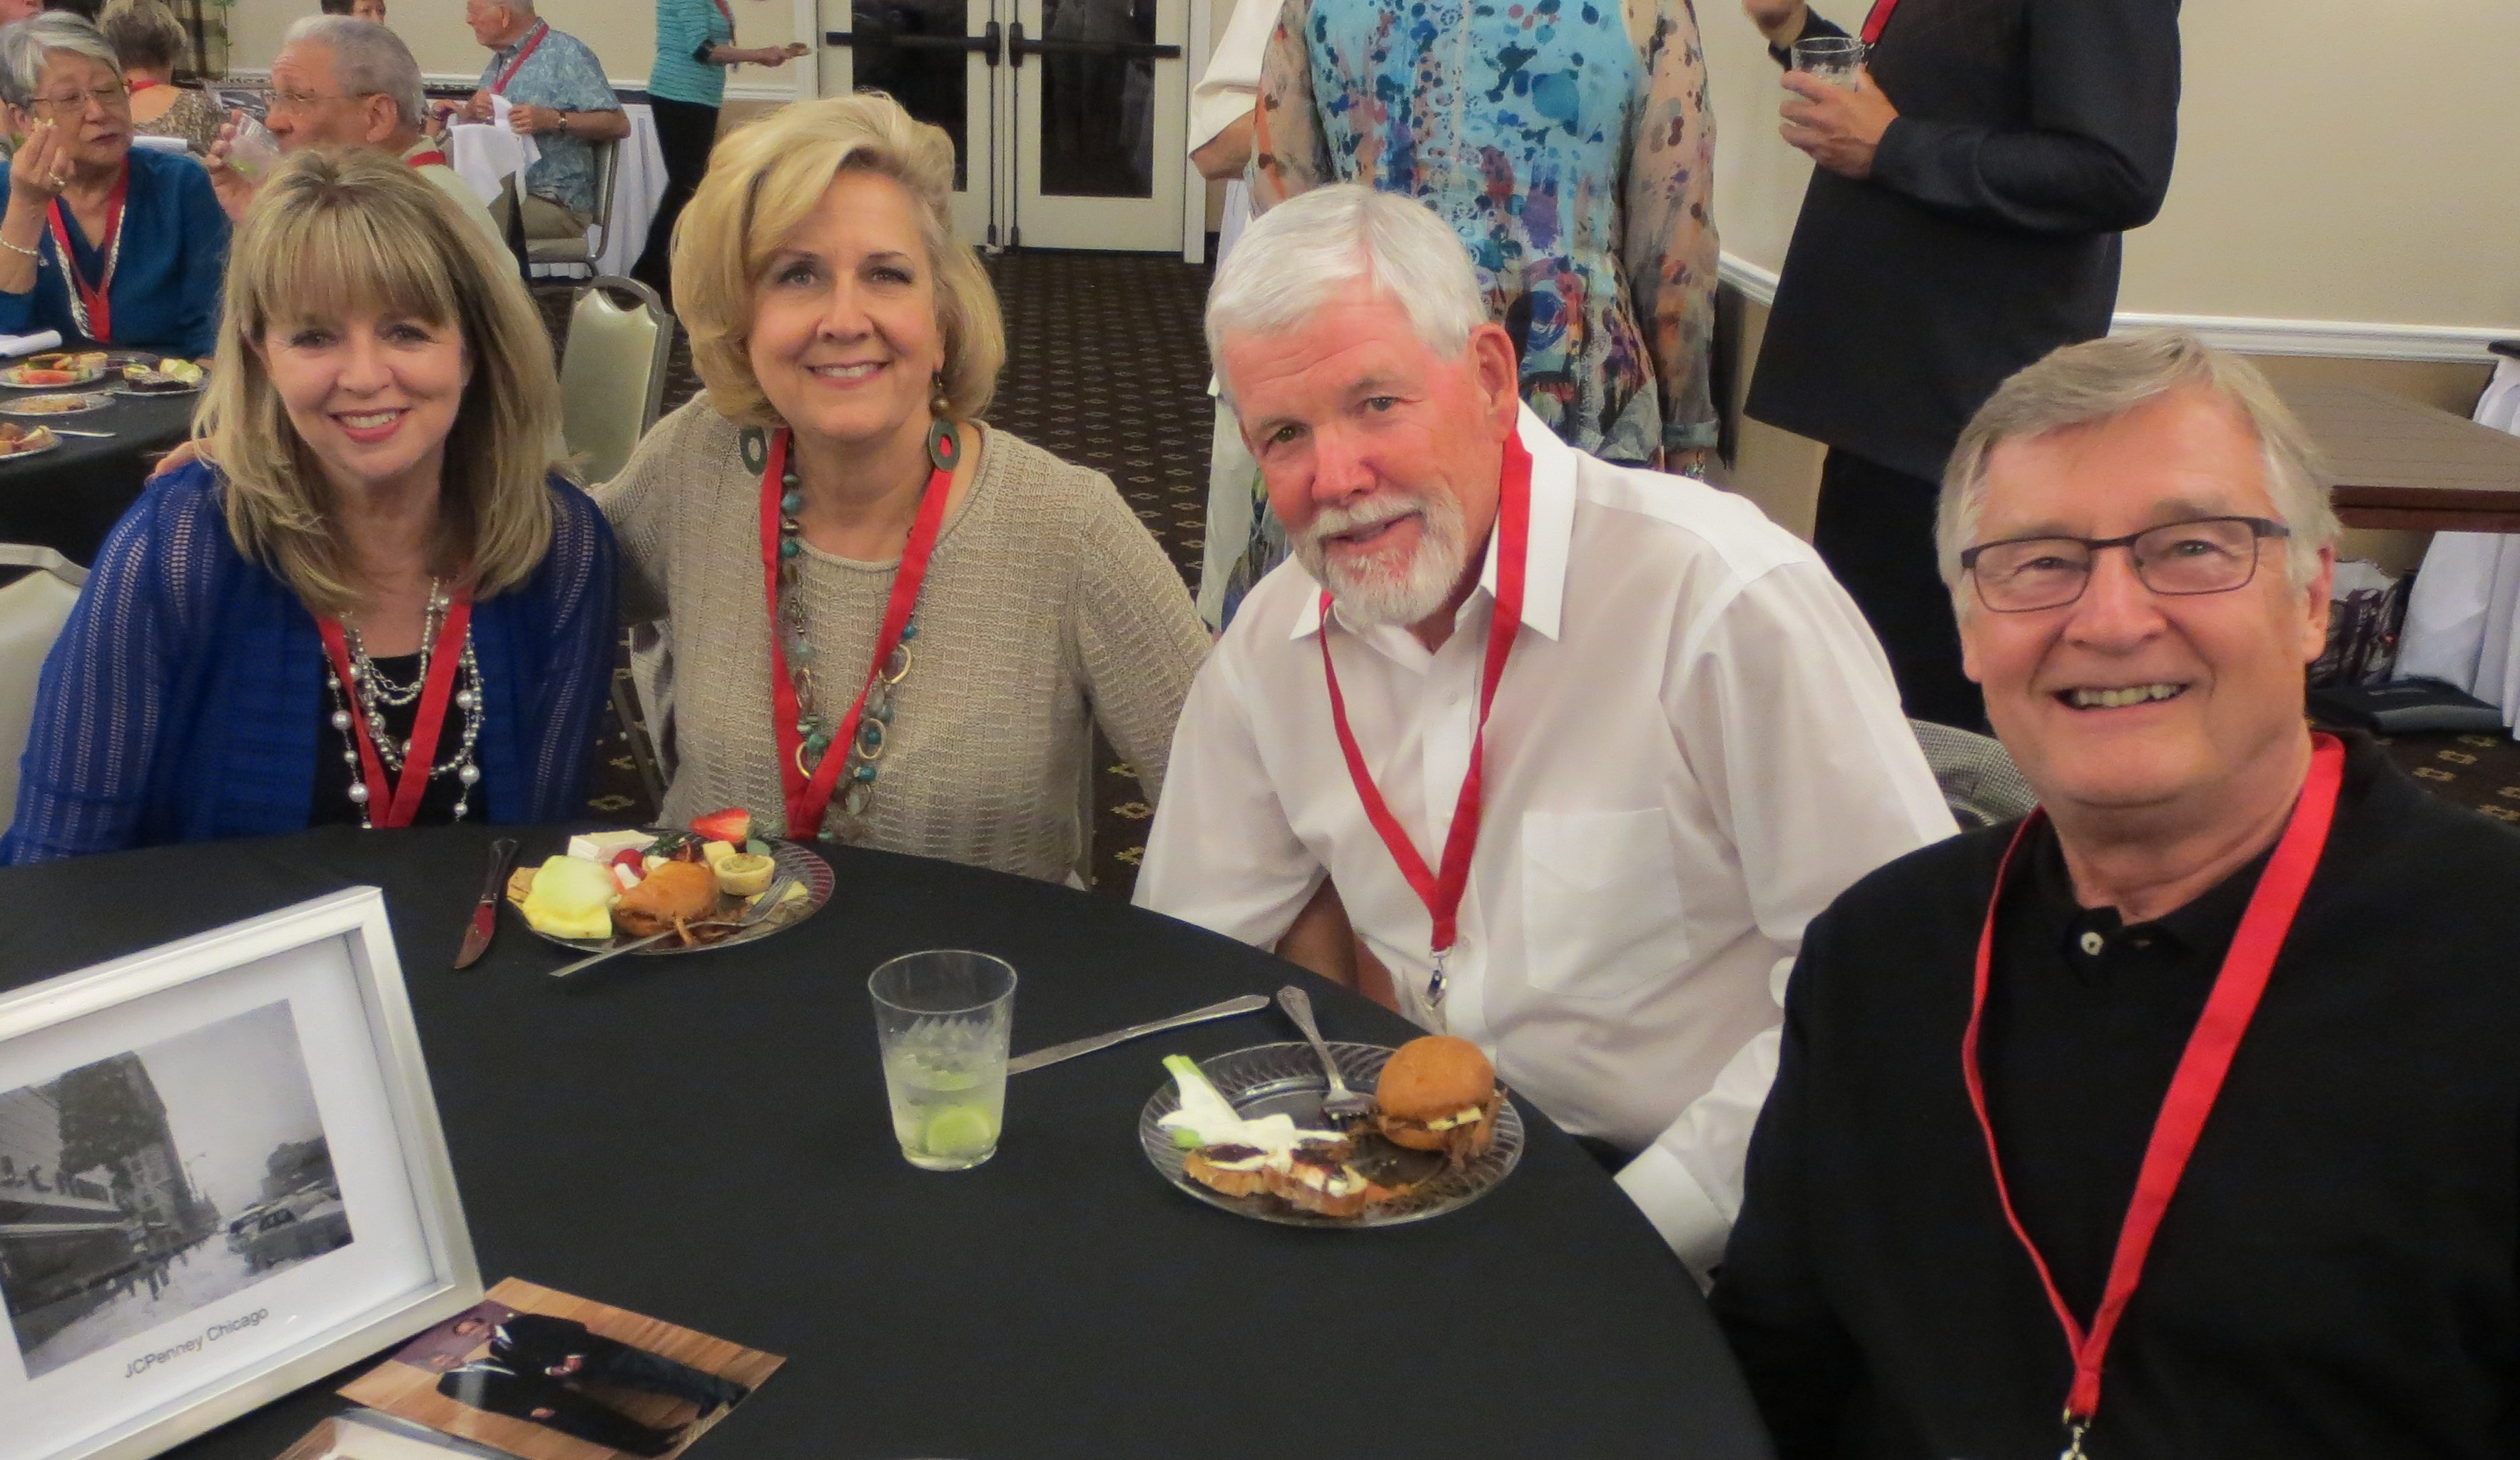 Cheryl Noble, Kathy Beard, Bob Beard and Larry Noble - Copy.JPG